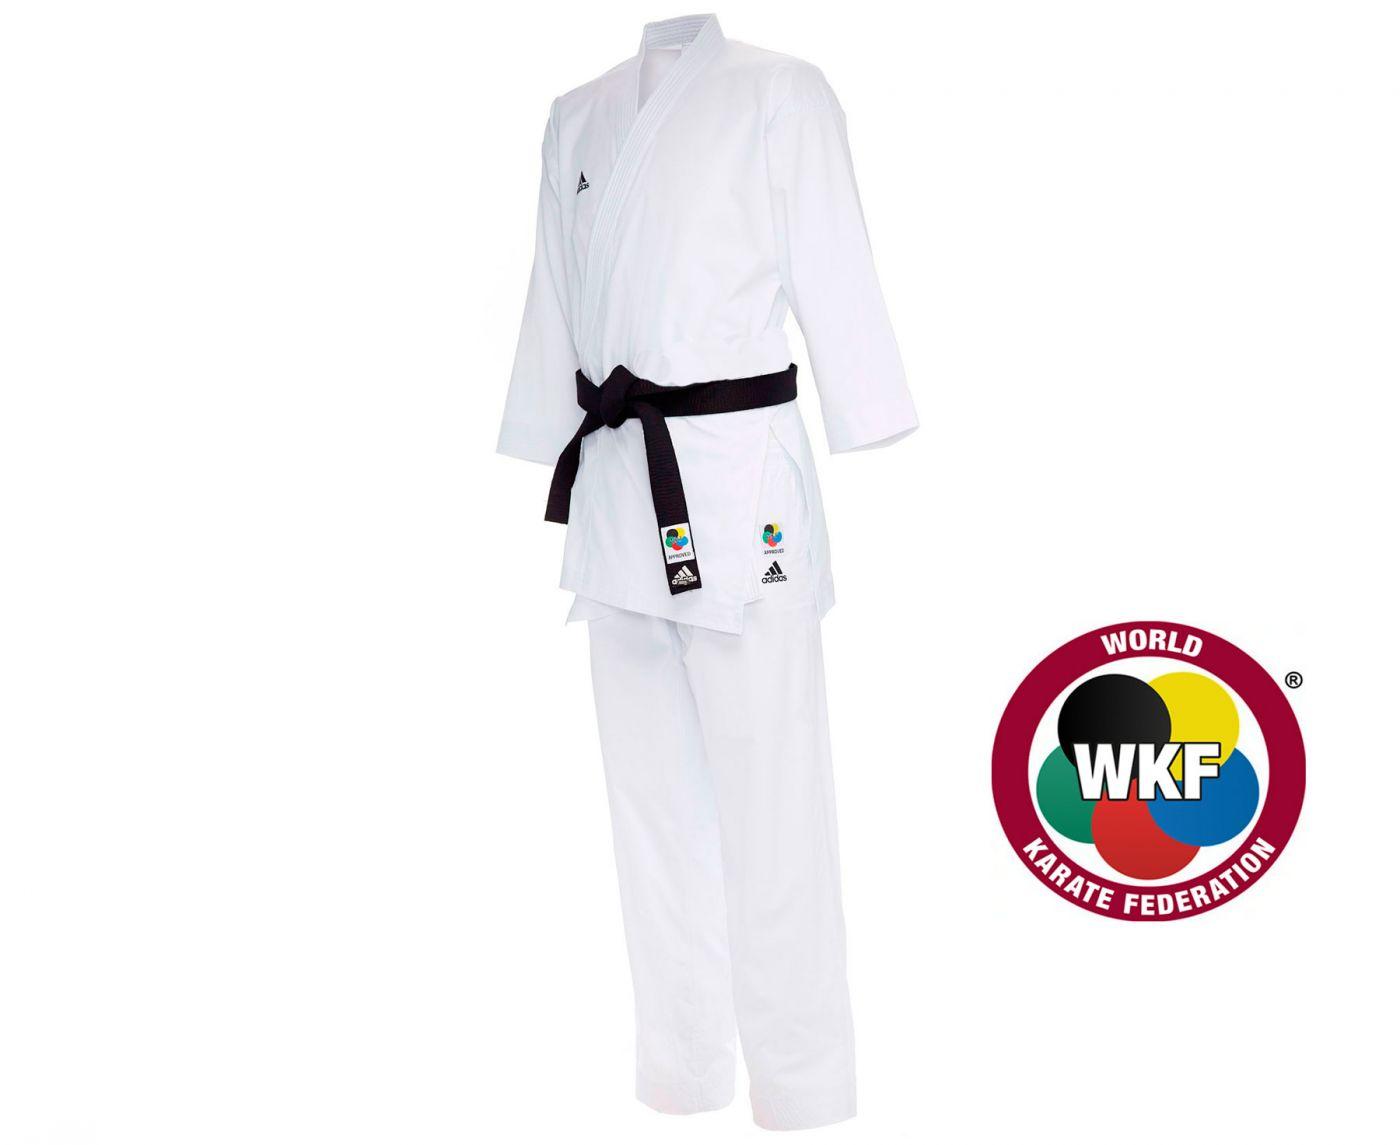 Кимоно для карате Adidas AdiLight WKF белое, размер 170 см, артикул K191SK